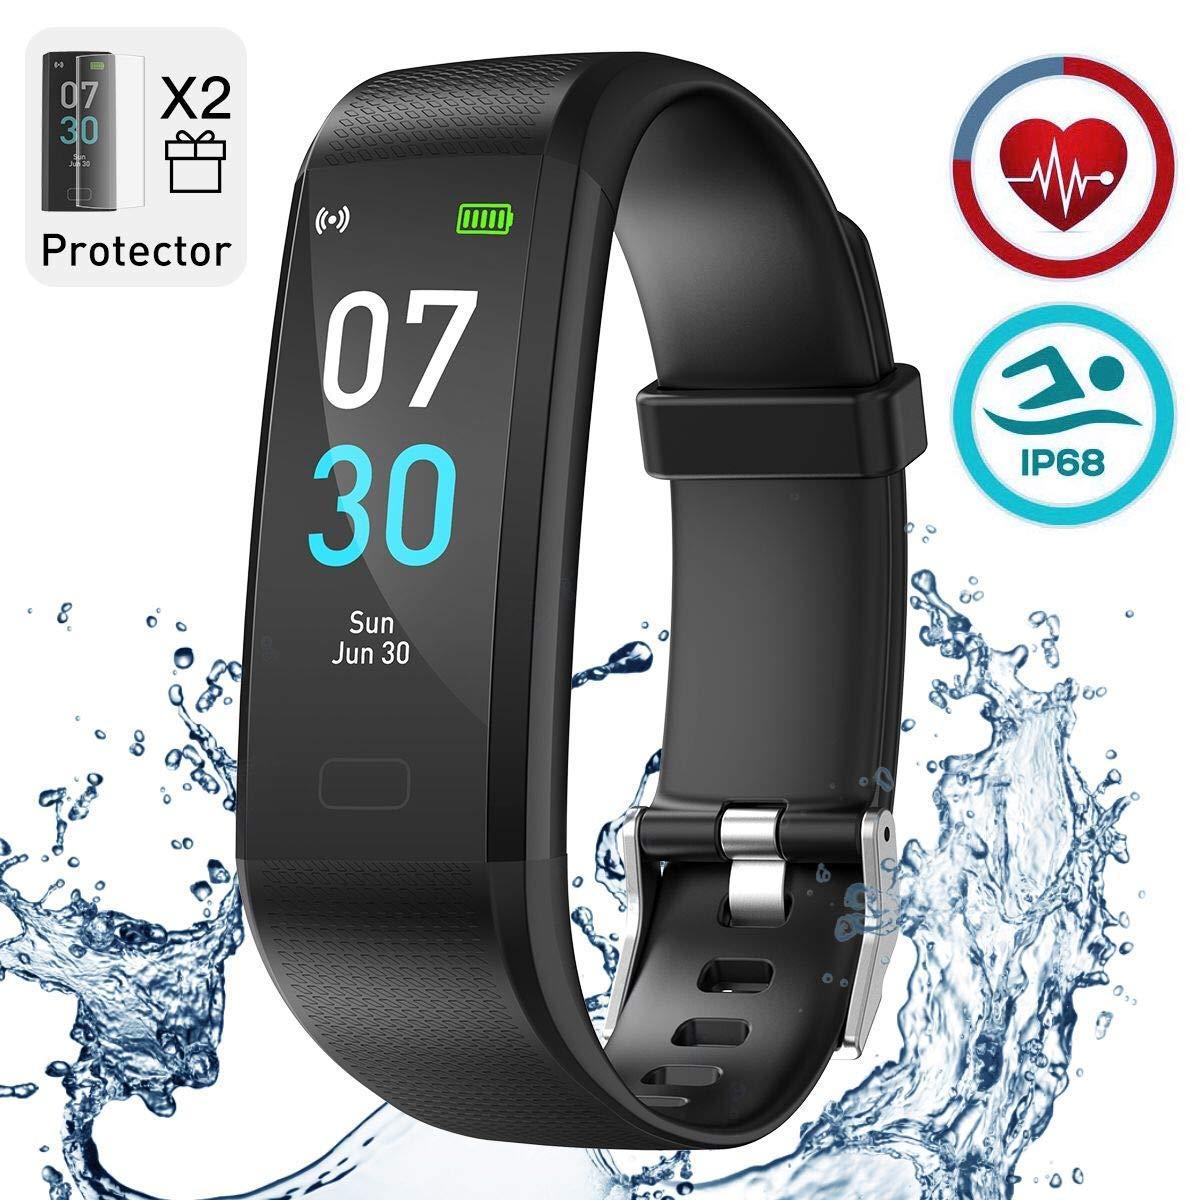 iWalker Smart Pulsera Fitness Tracker, Pulsera Actividad de Frecuencia Cardíaca, Impermeable IP68, Podómetro Deportiva… 1